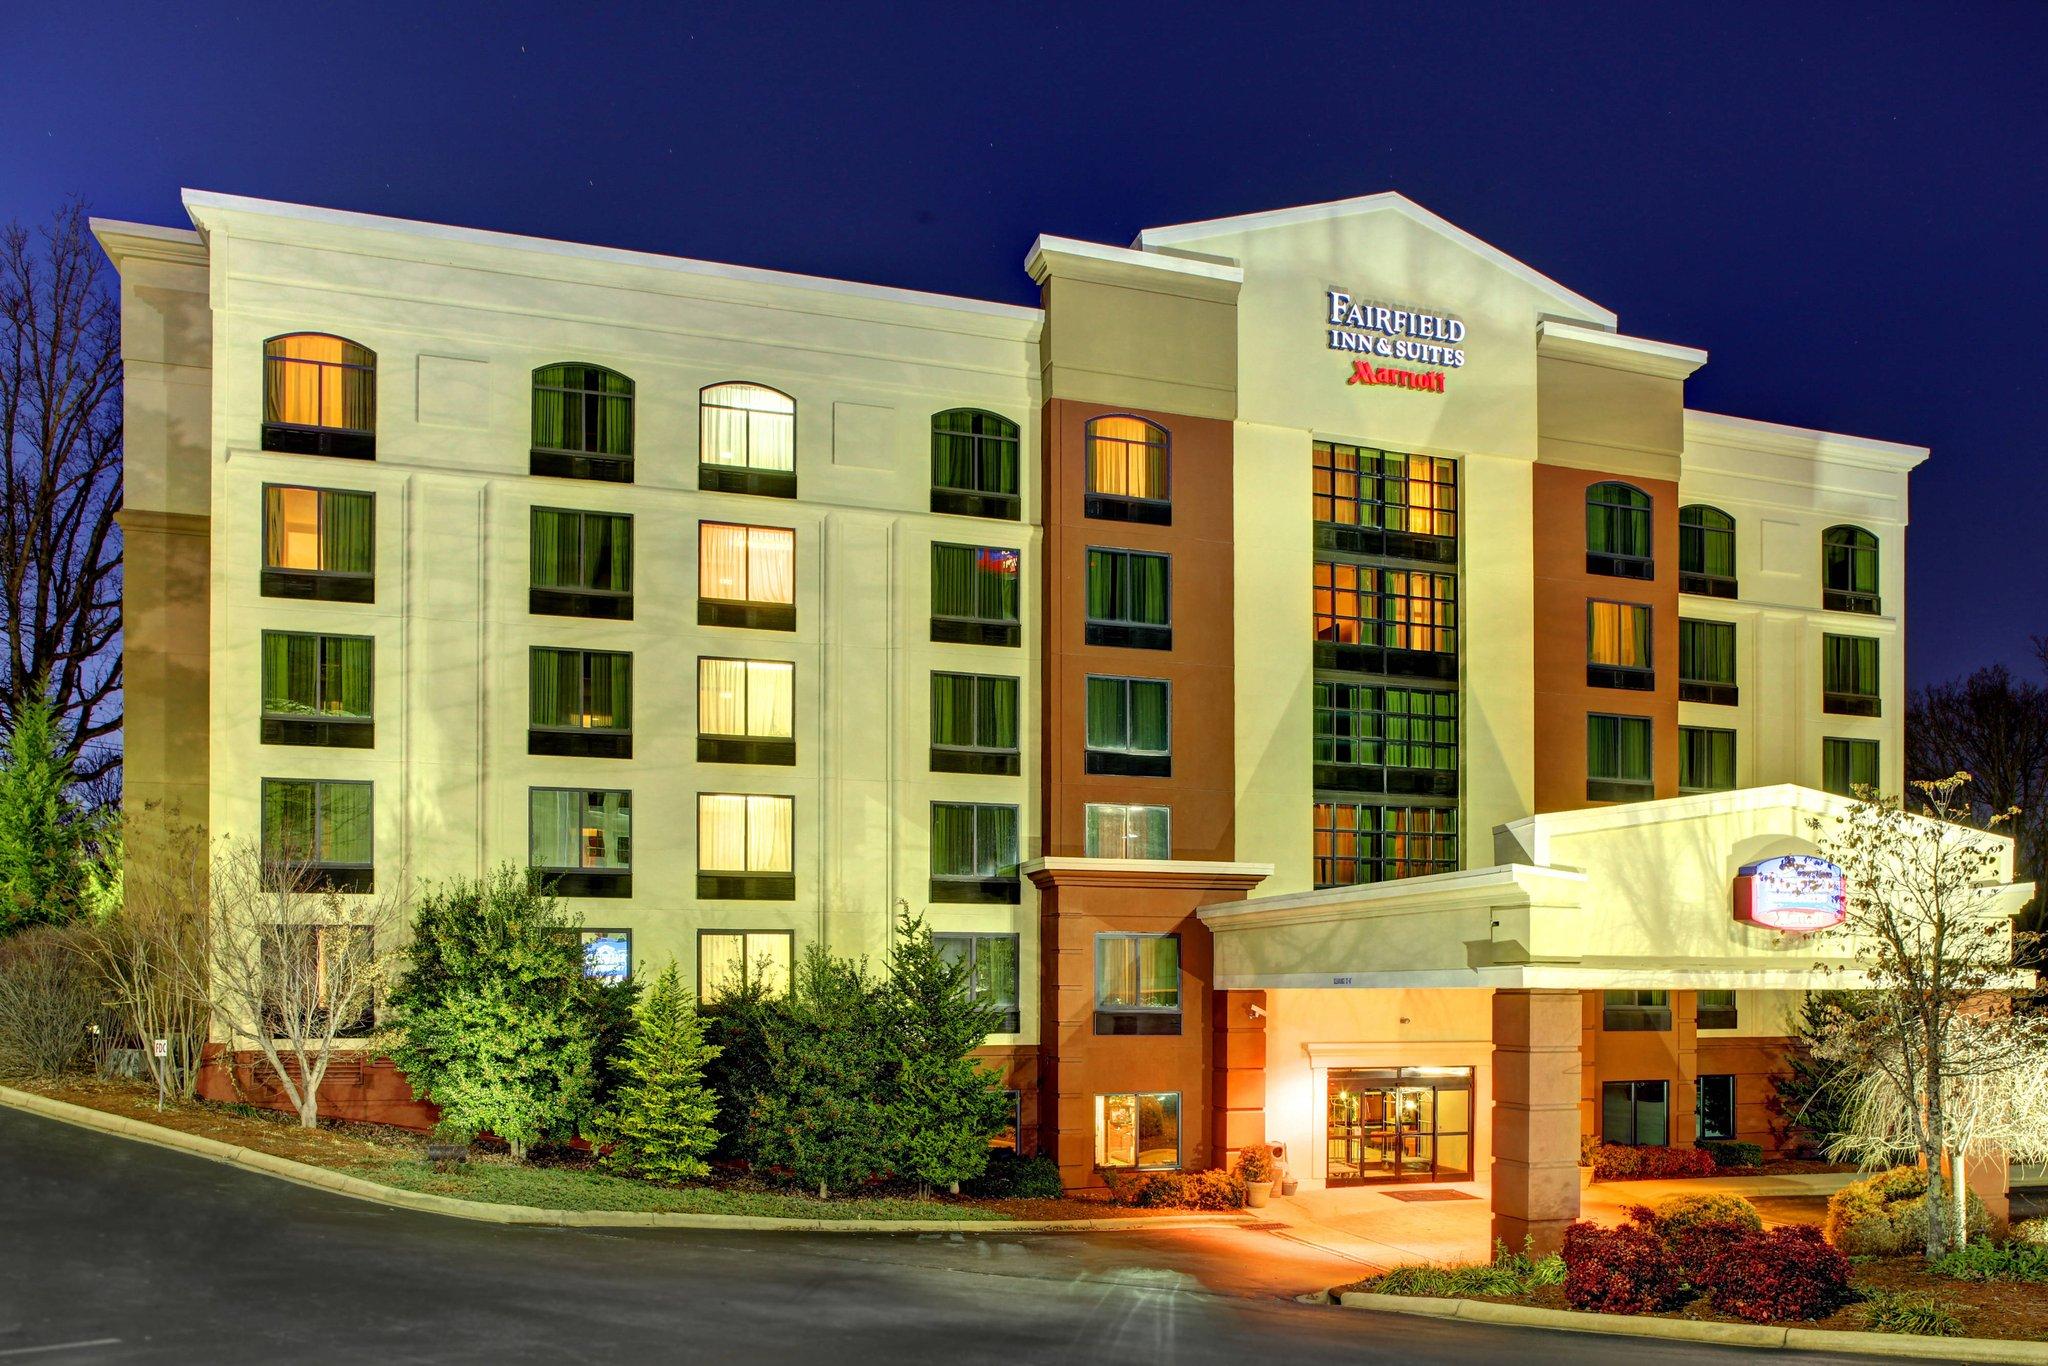 Fairfield Inn & Suites Asheville South